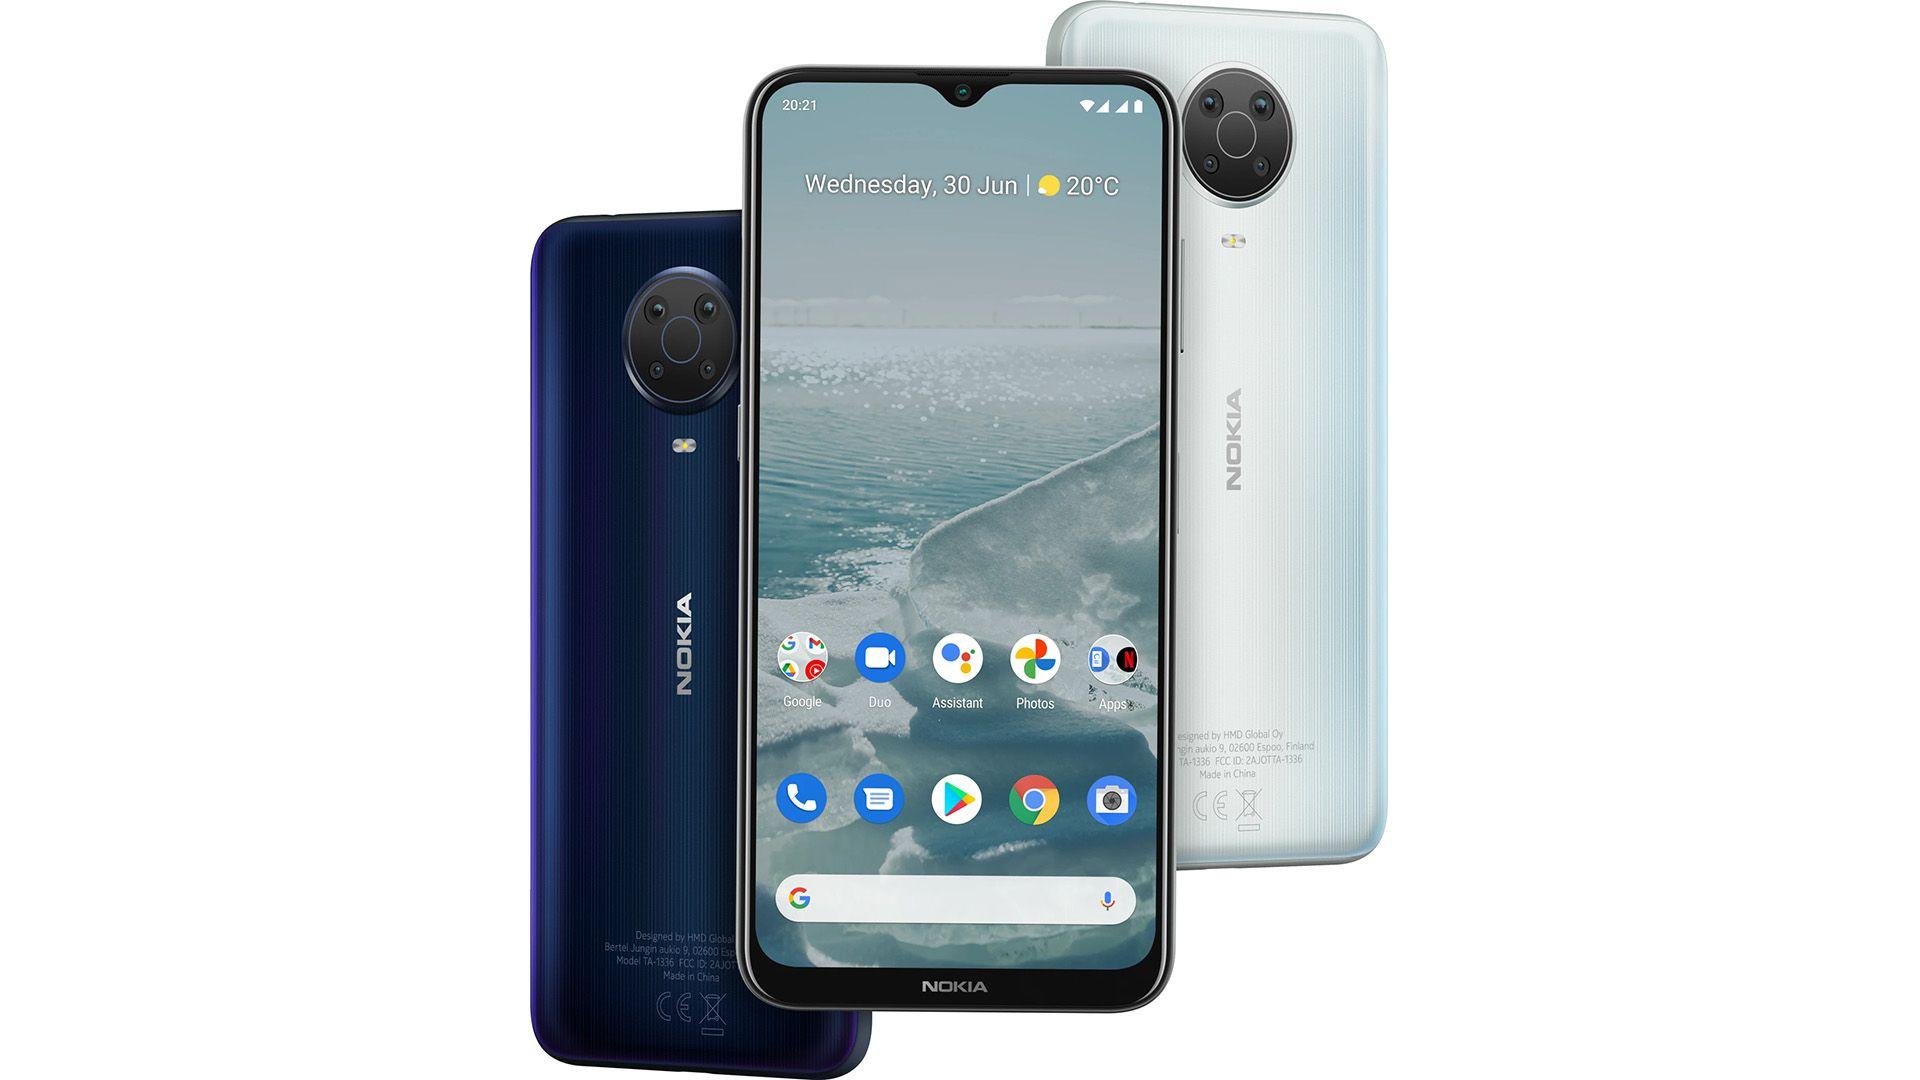 The Nokia G20 smartphone